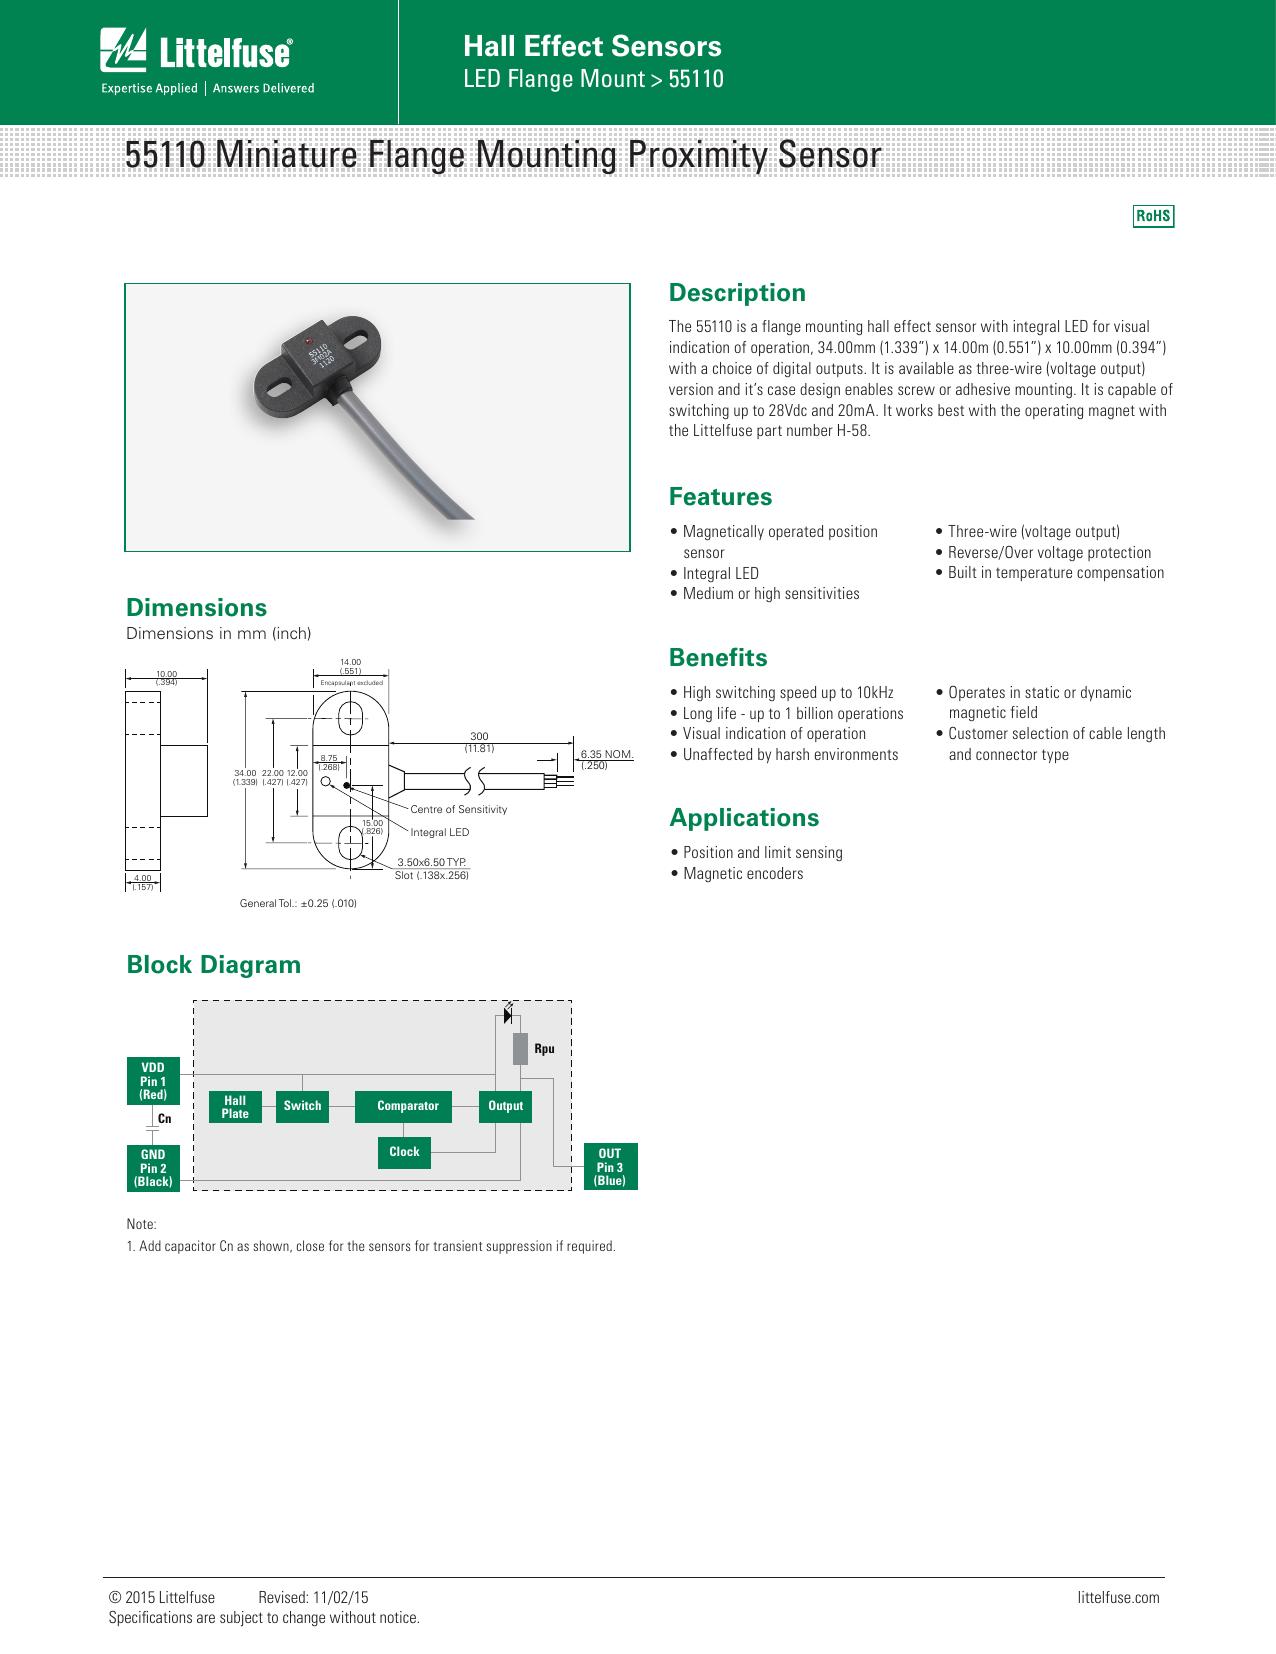 Littelfuse Hall Effect Sensors 55110 Datasheet Diagram